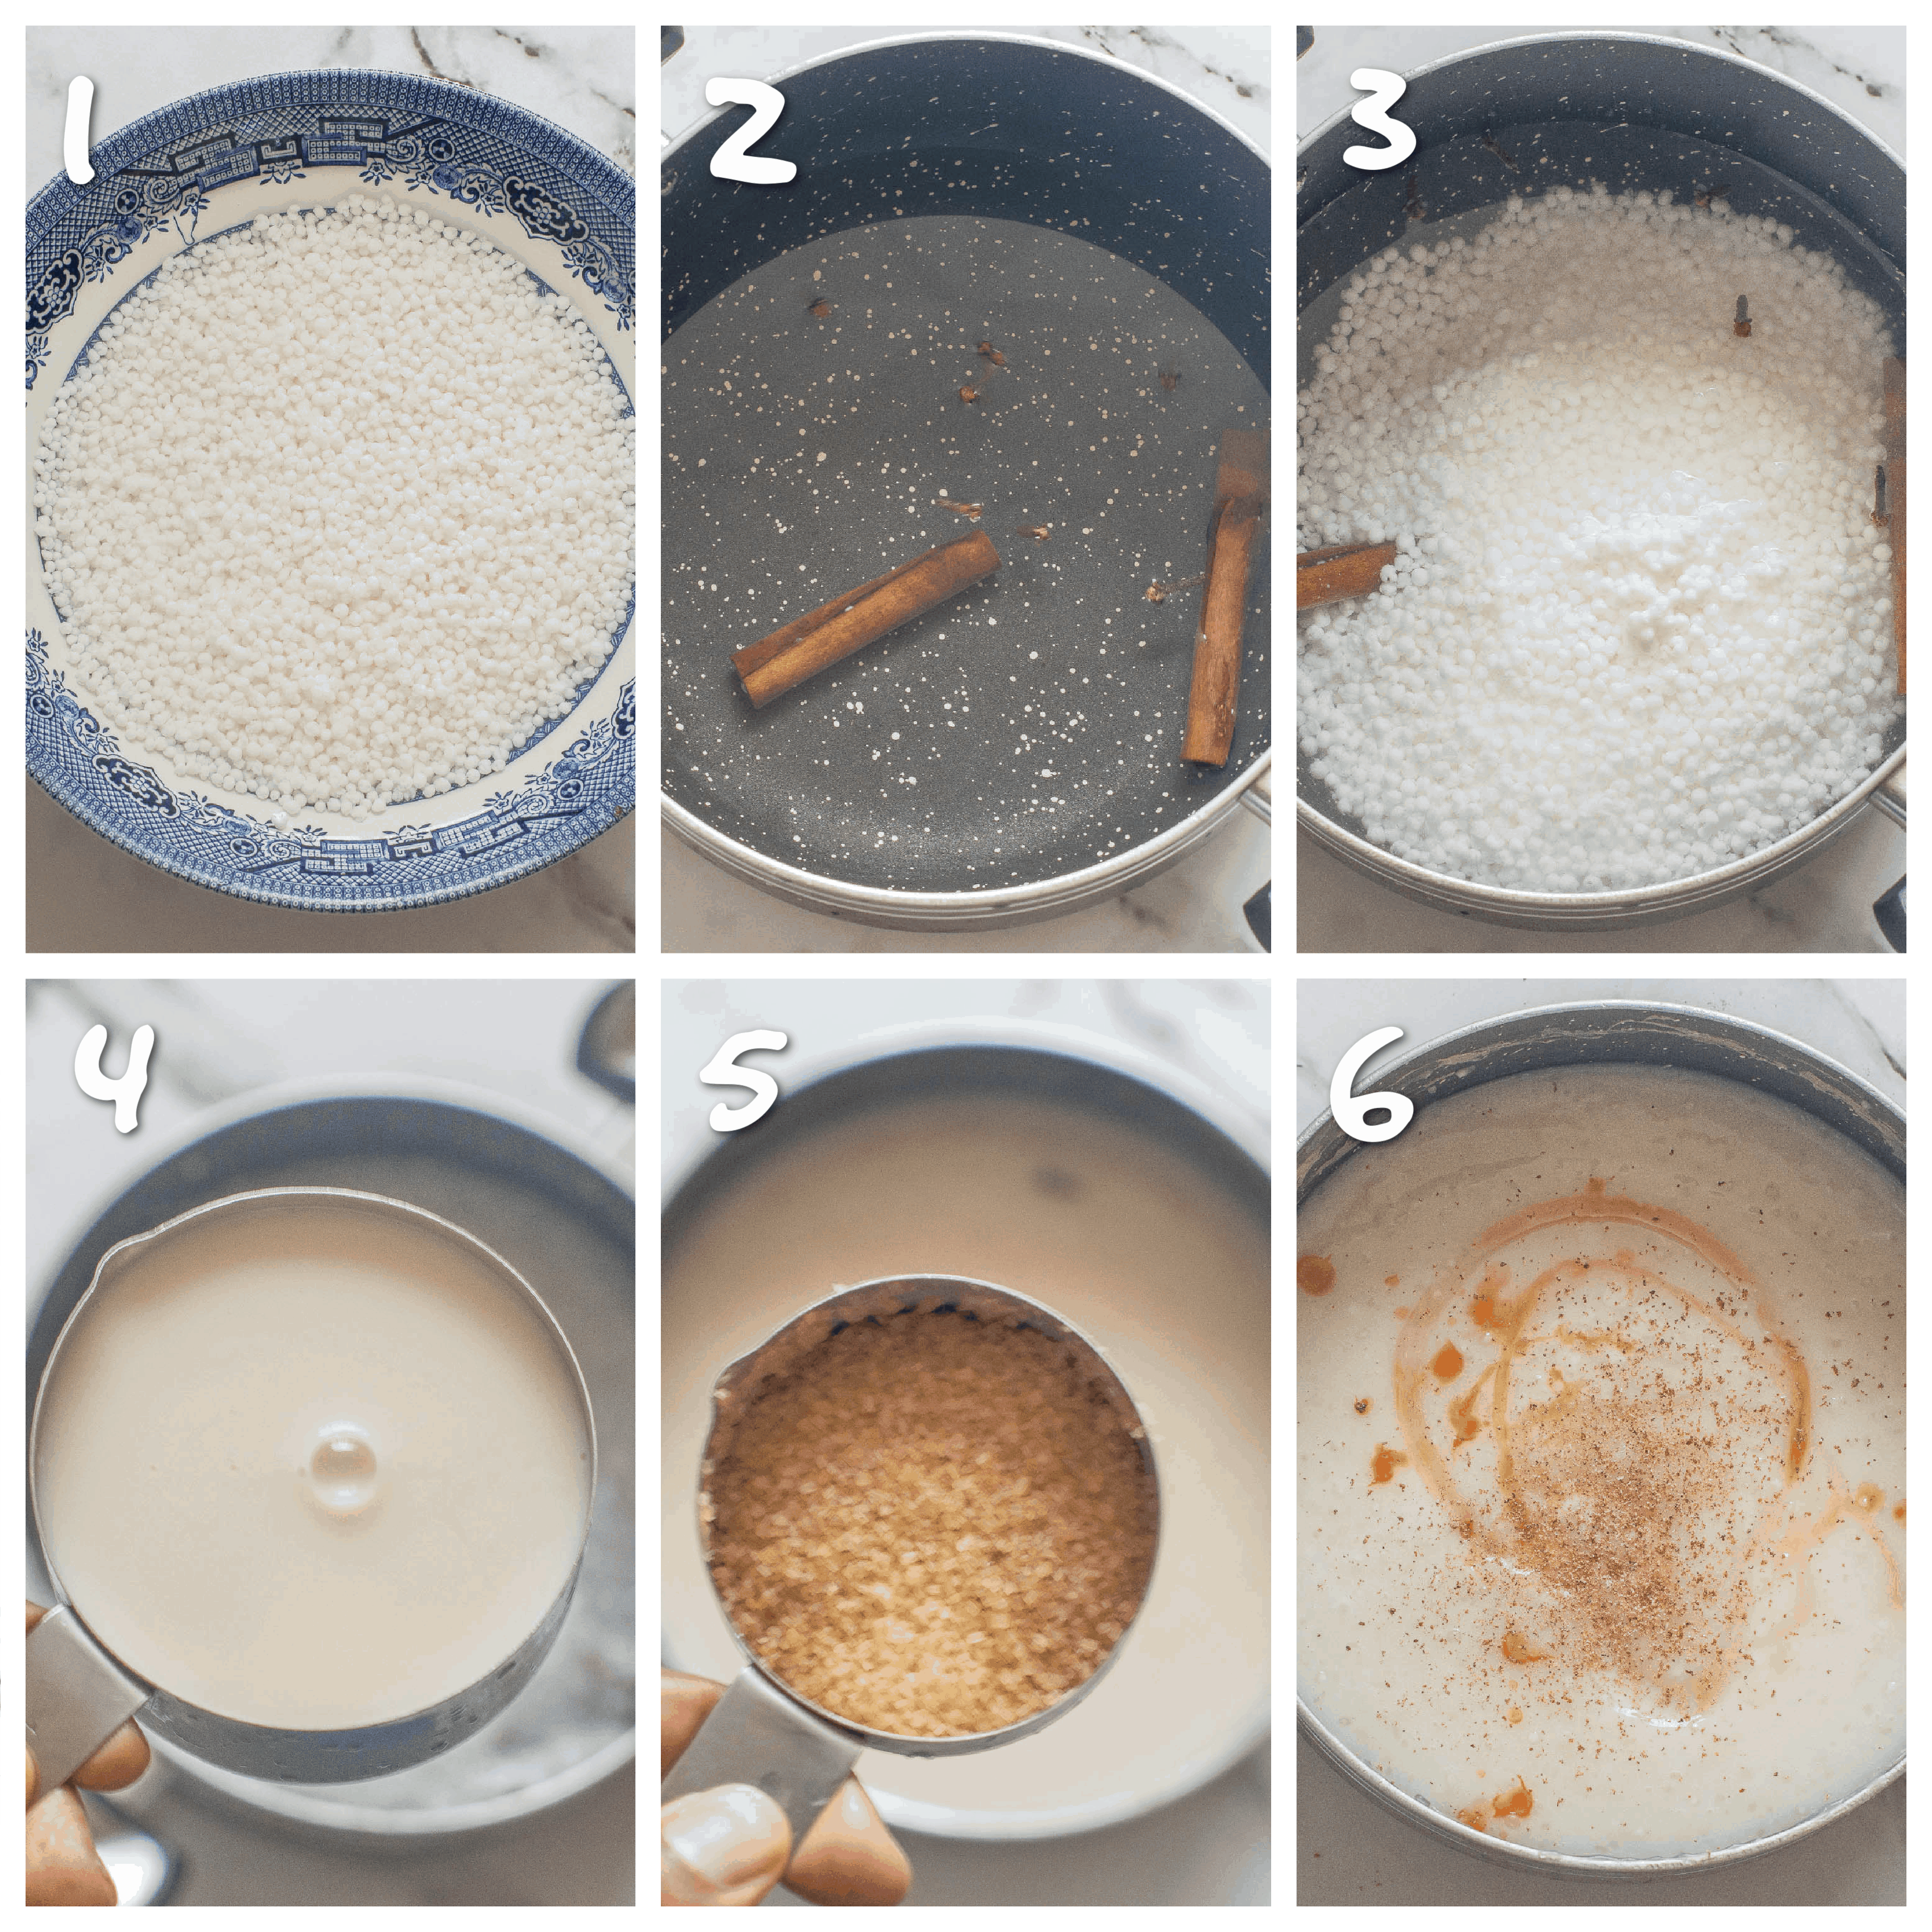 step1-6 boiling the sago pearls to make porridge